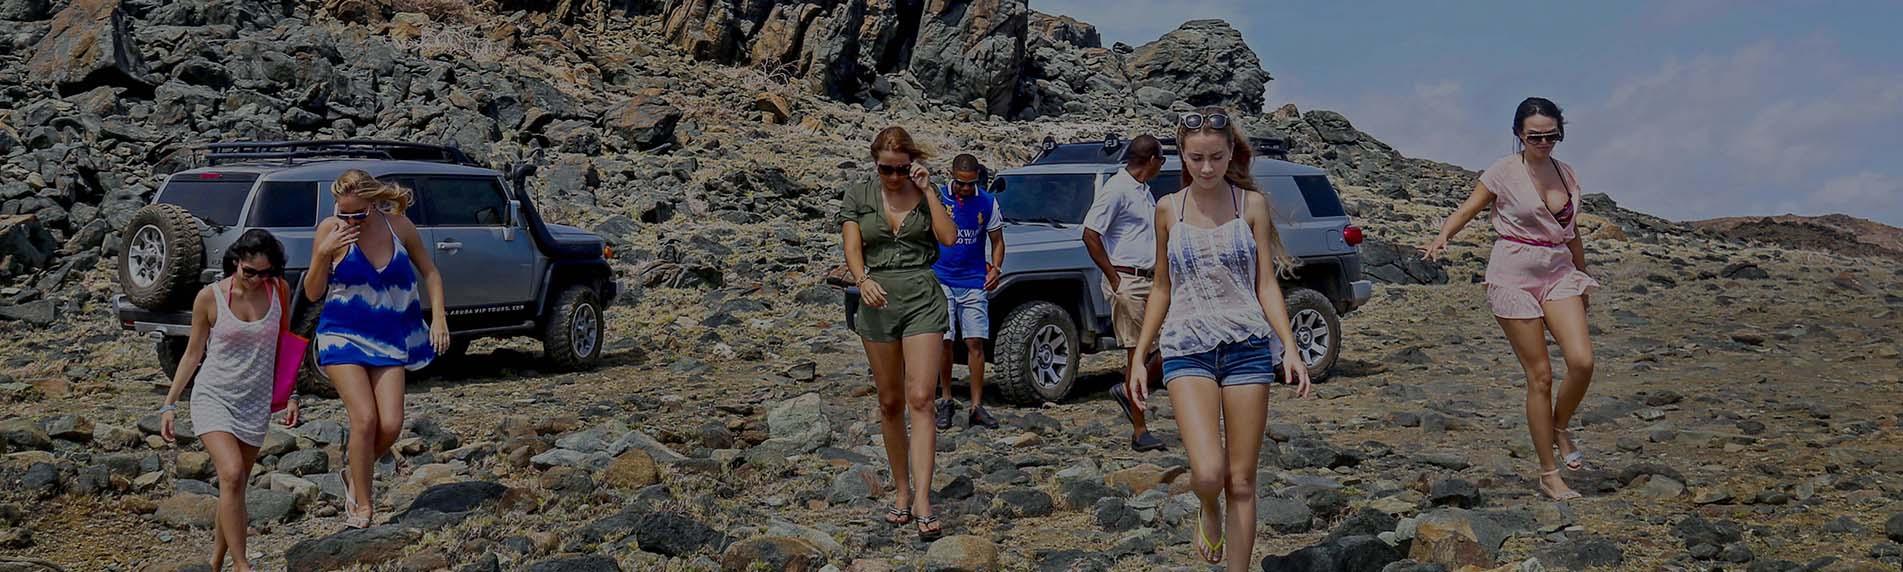 Aruba Private Jeep Tour - Six Hour